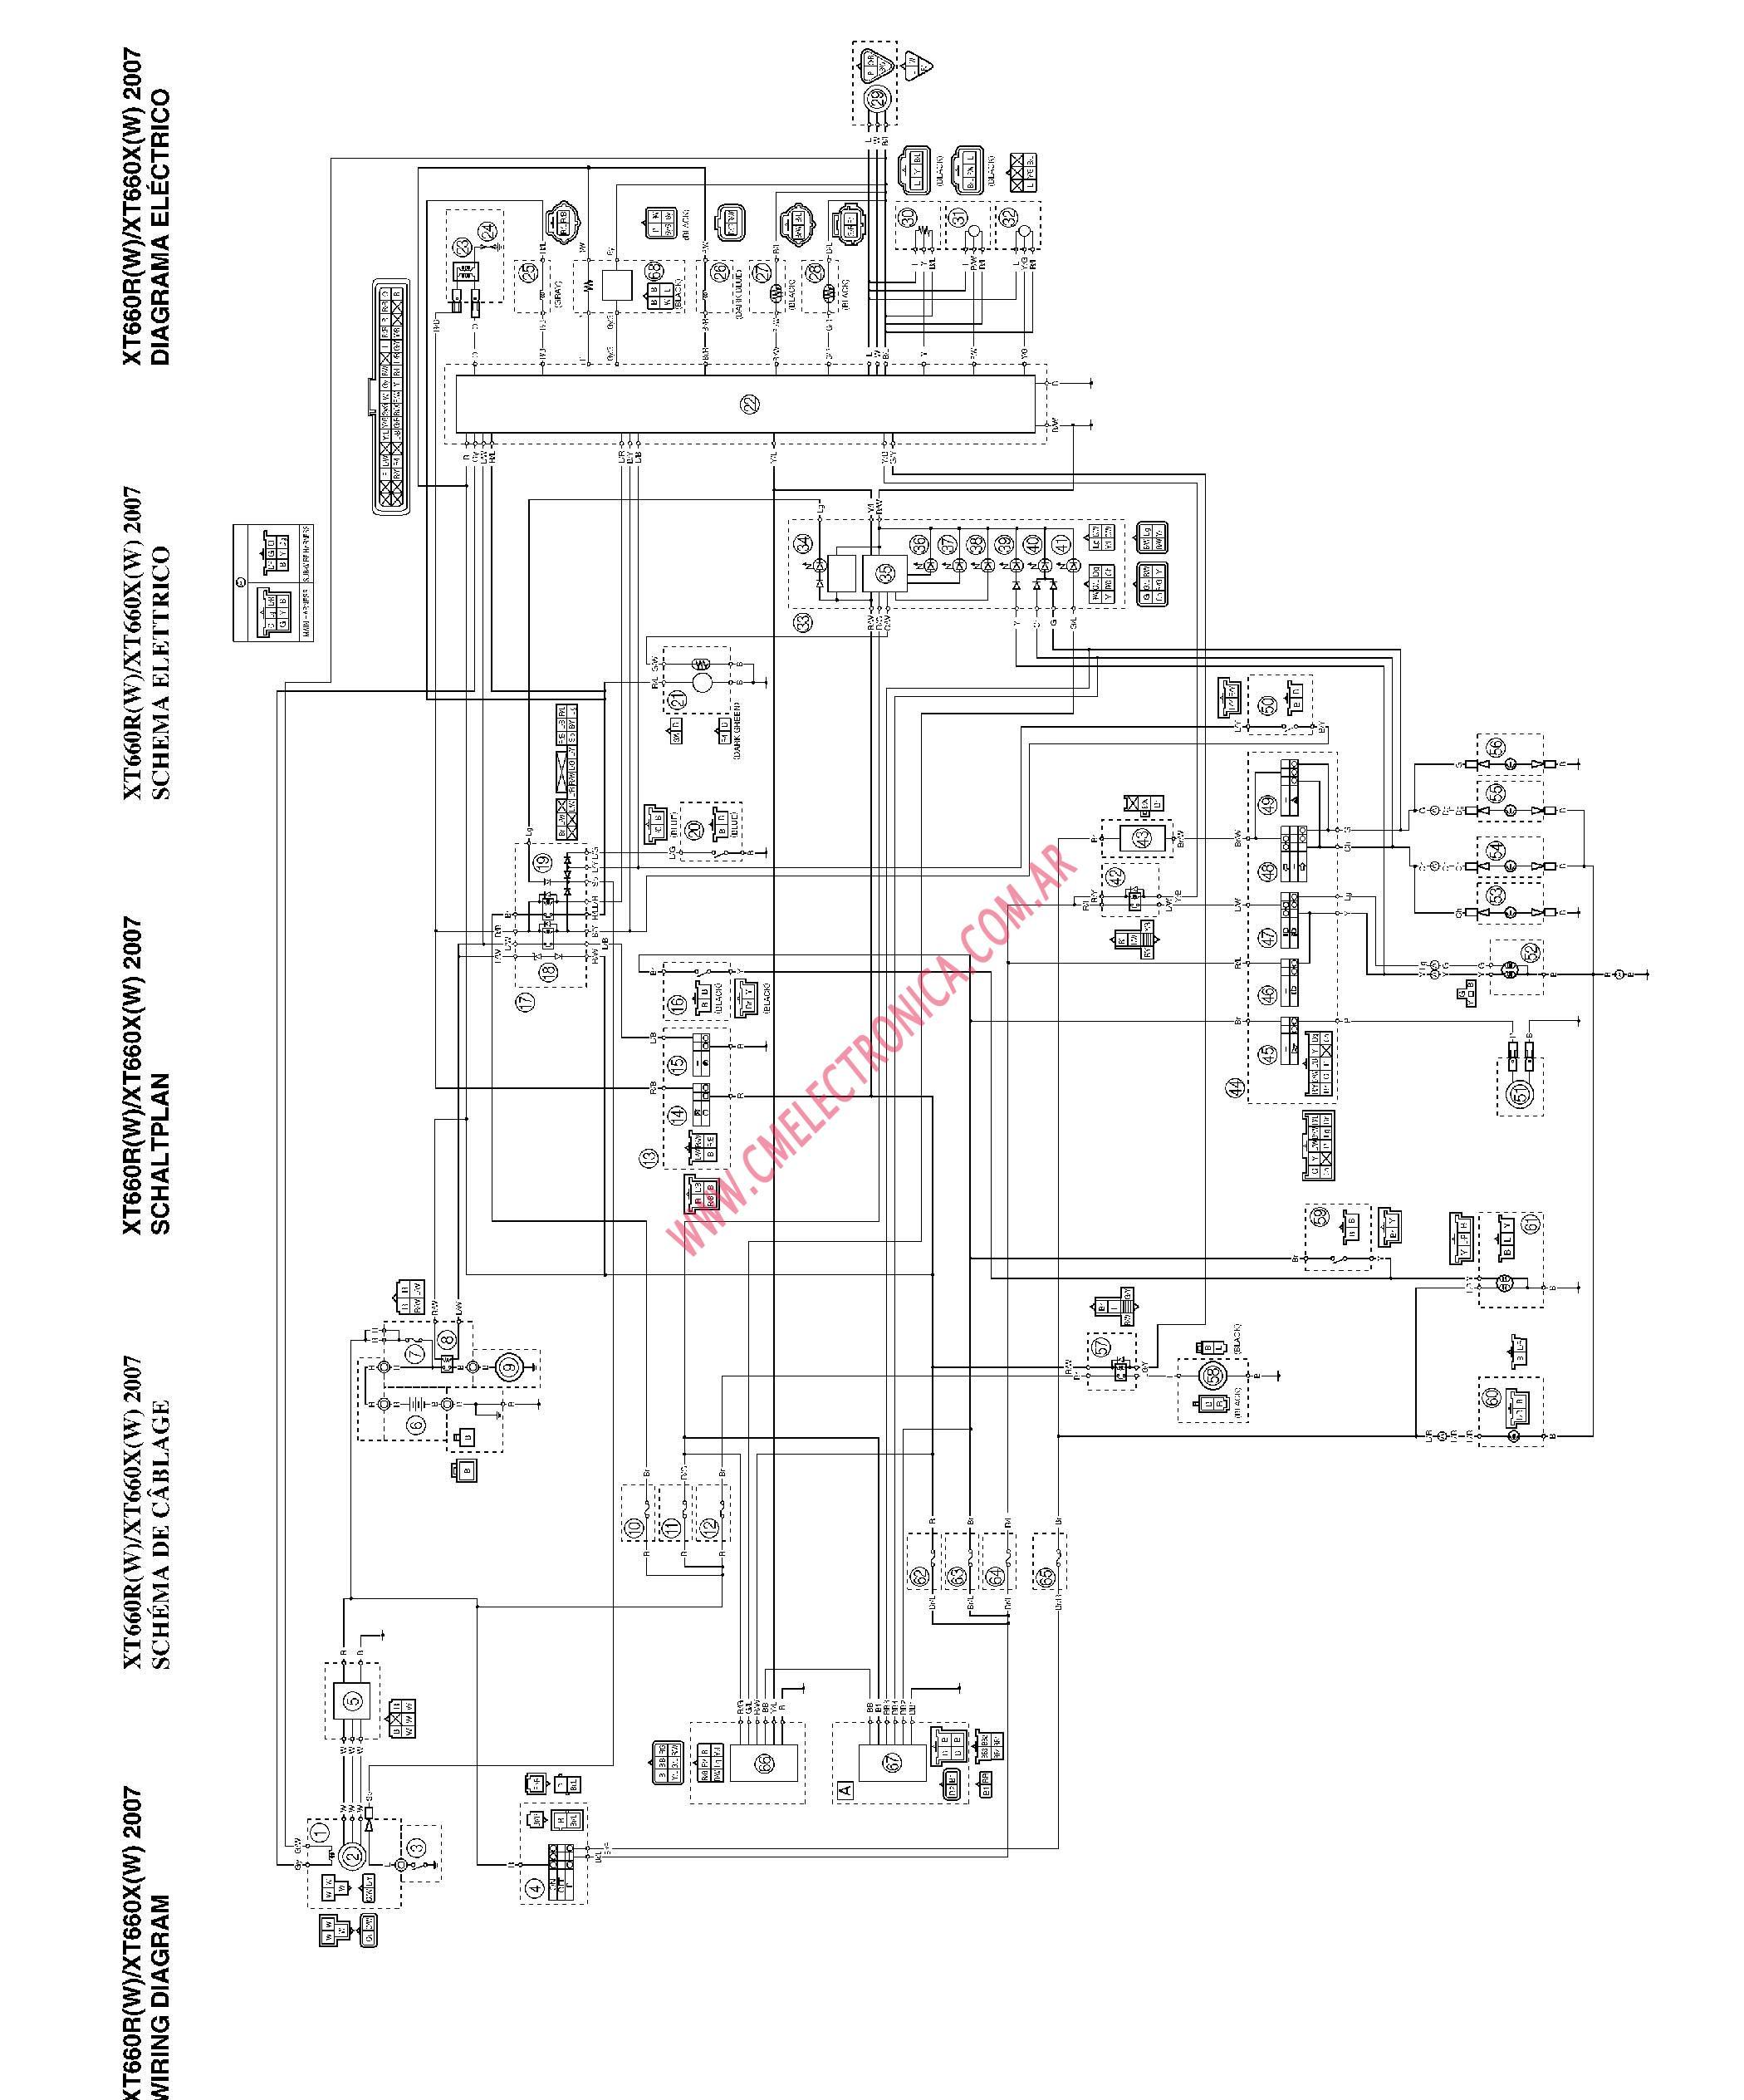 yamaha moto 4 cdi wire diagram auto electrical wiring diagram rh wiring radtour co Yamaha Cdi Wiring Diagram Yamaha Cdi Wiring Diagram